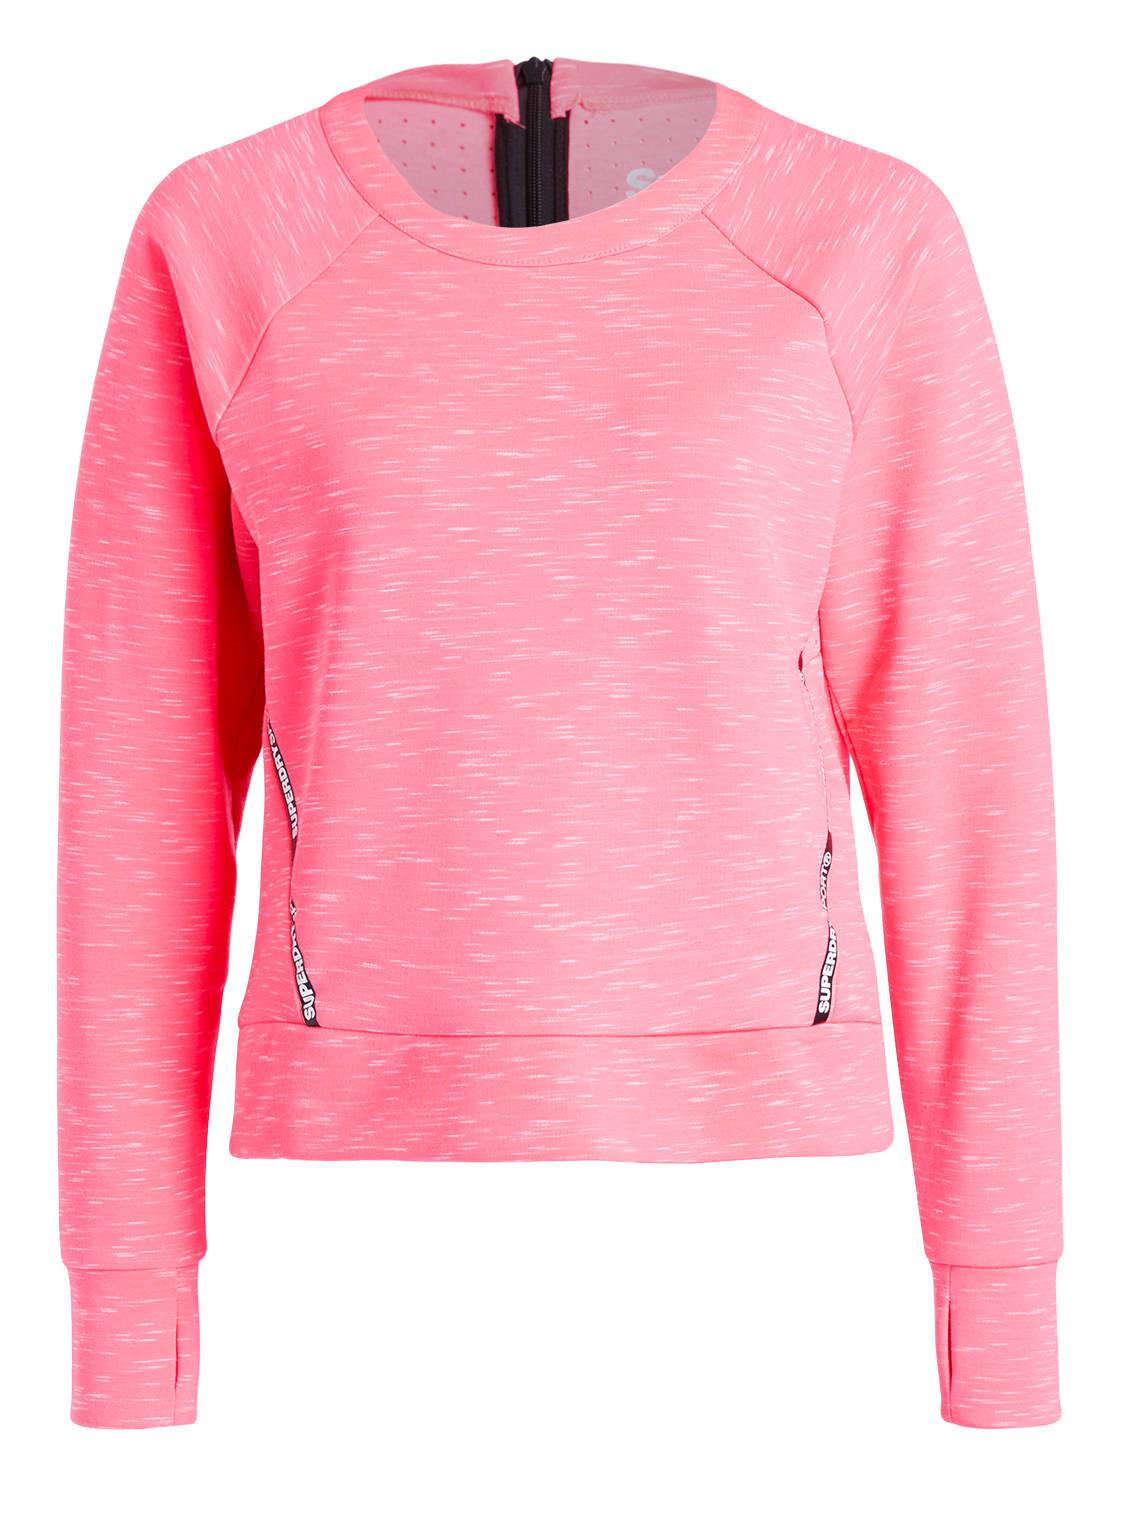 Superdry Sweatshirt CORE GYM TECH